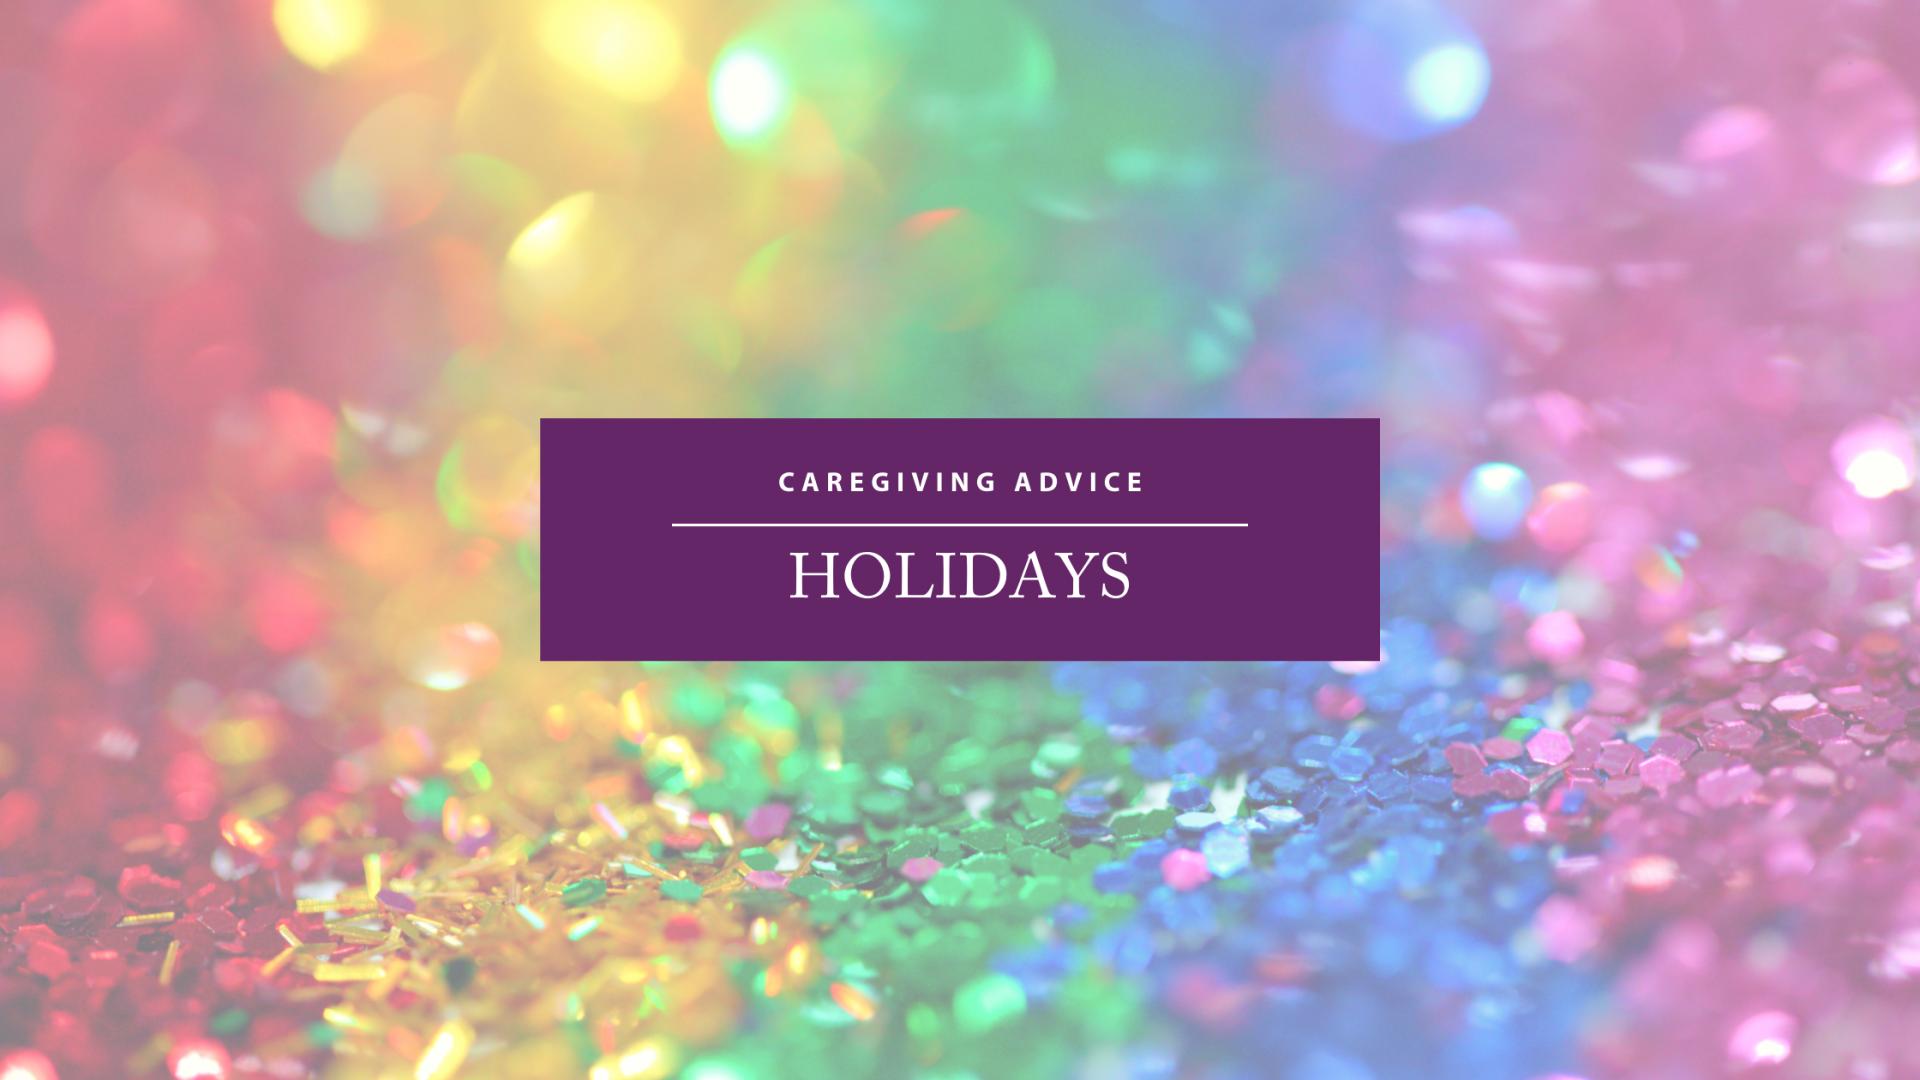 Blog Categories - Holidays